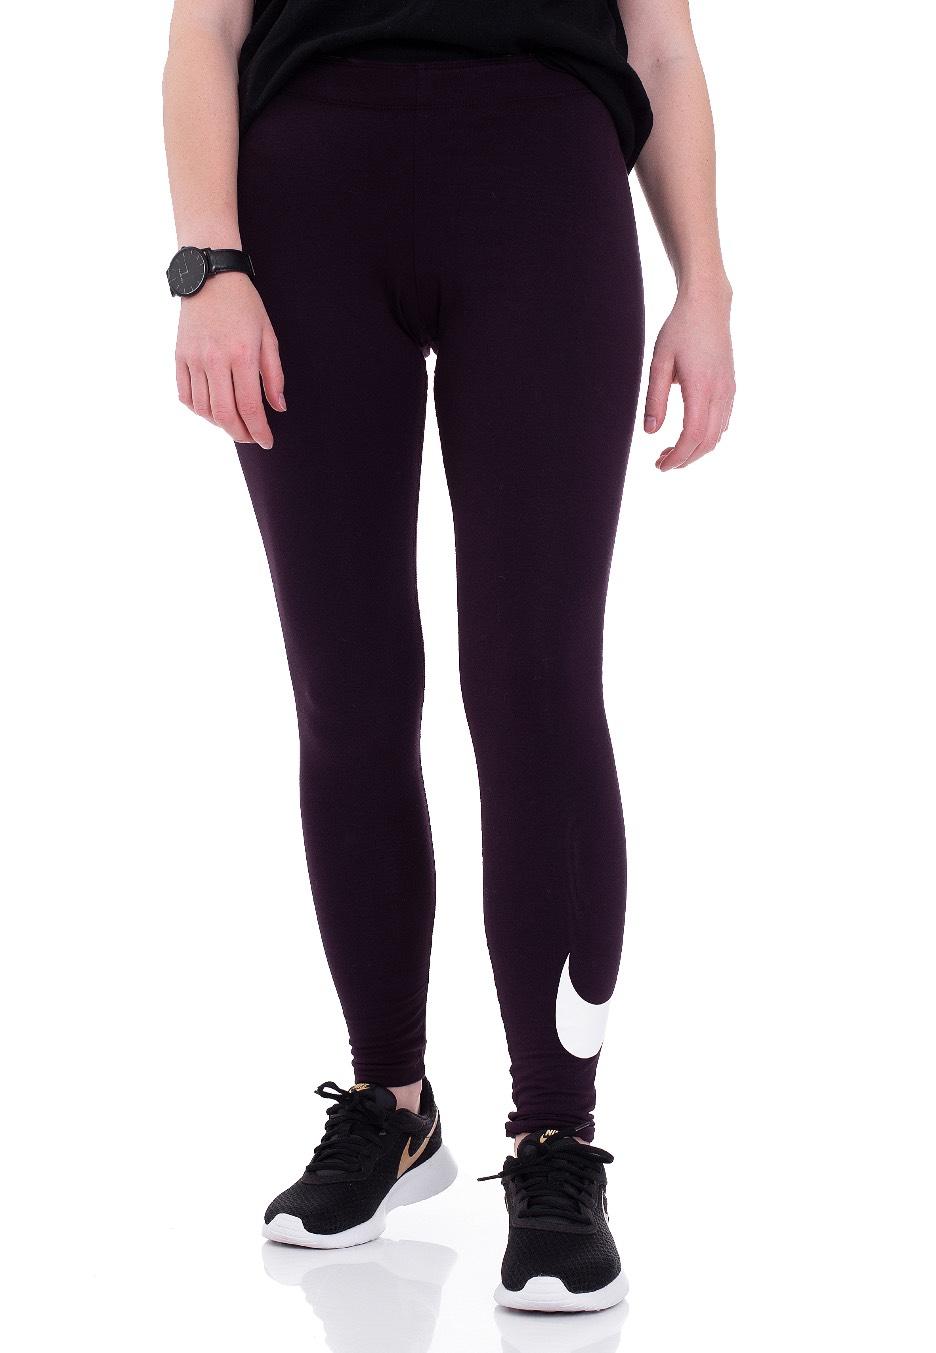 ea938c3daa1 Nike - Boutique streetwear - Impericon.com FR